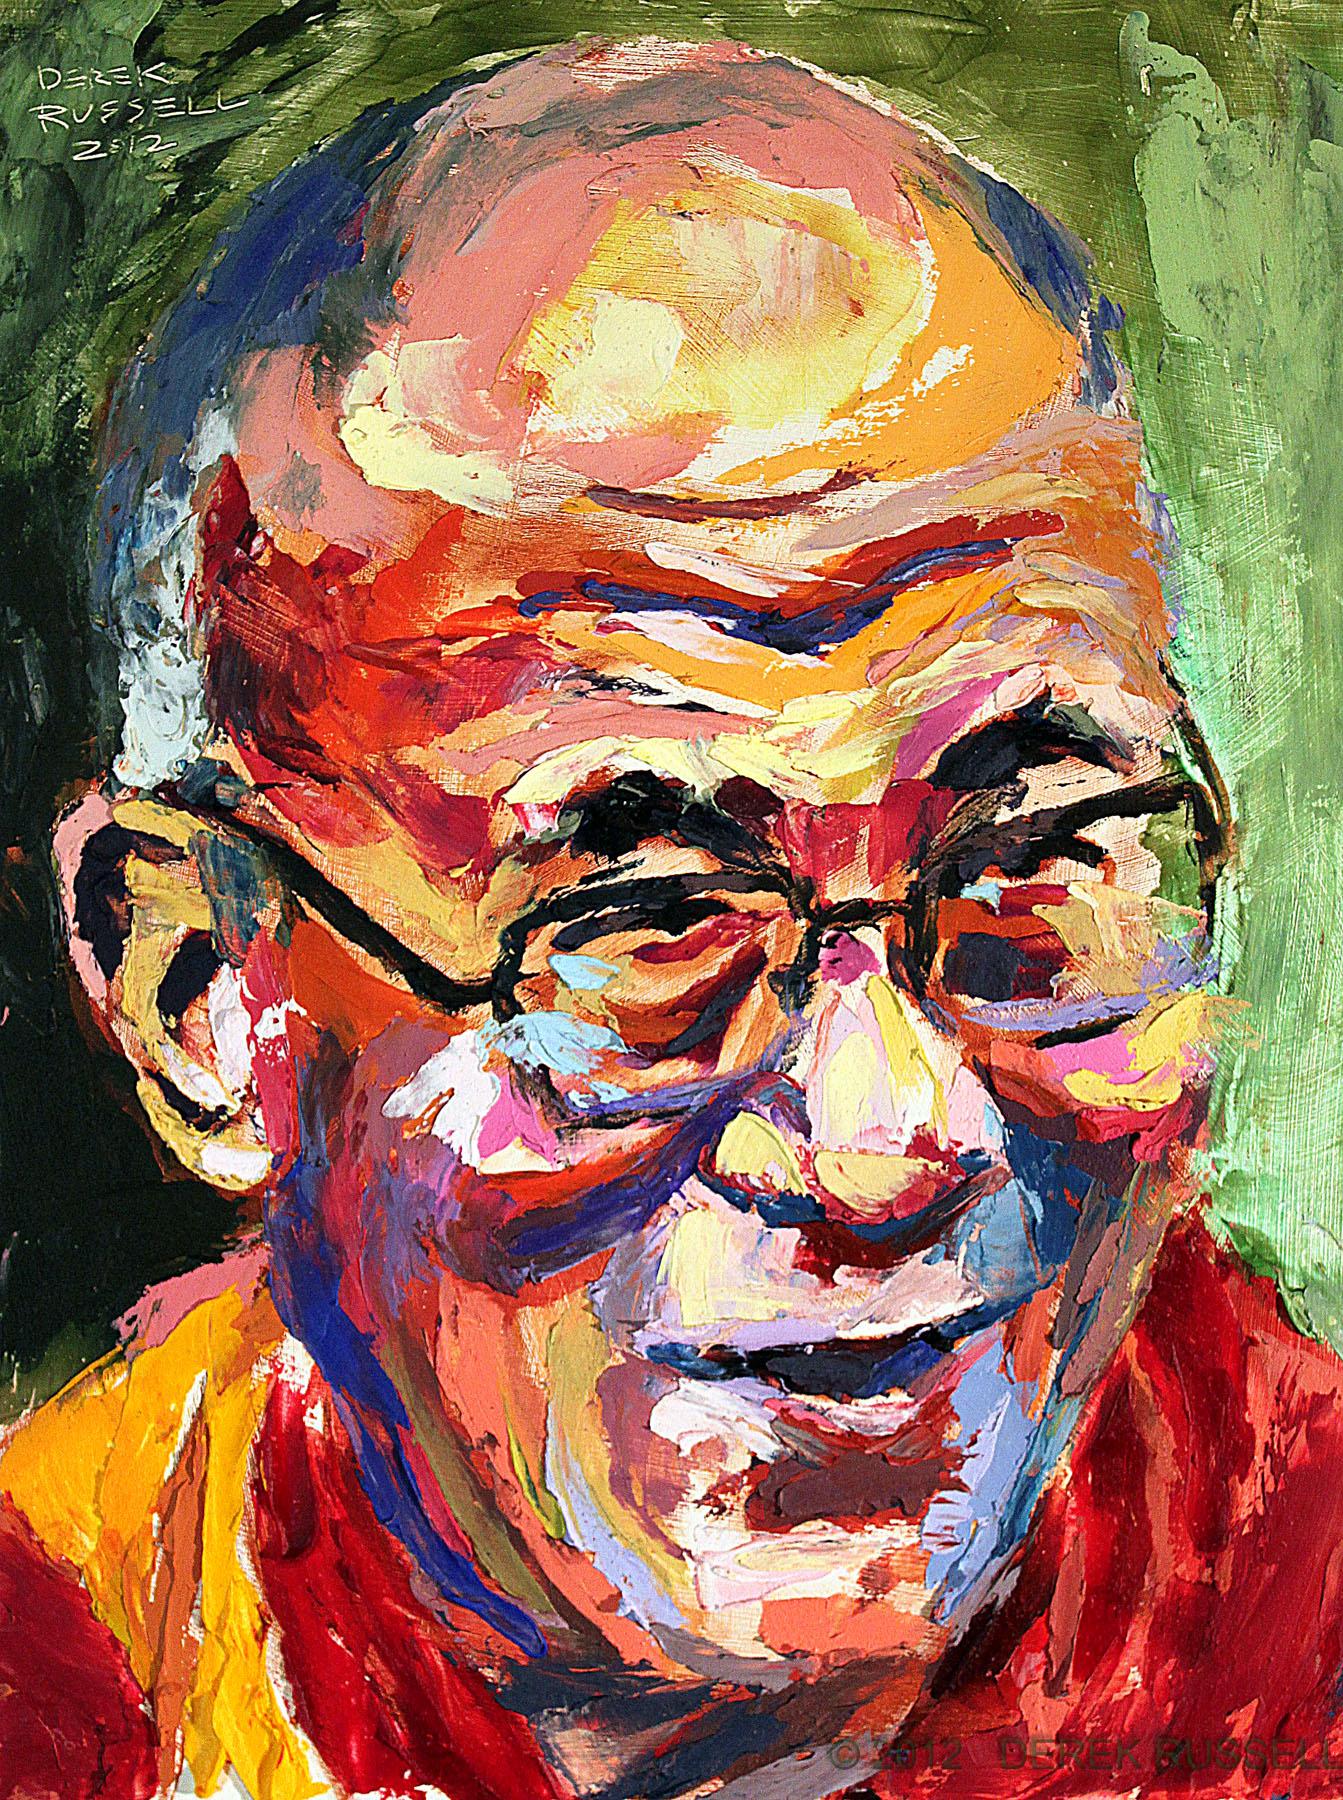 Dalai Lama Original Fine Art Oil Painting by Celebrity & Corporate Artist Derek Russell